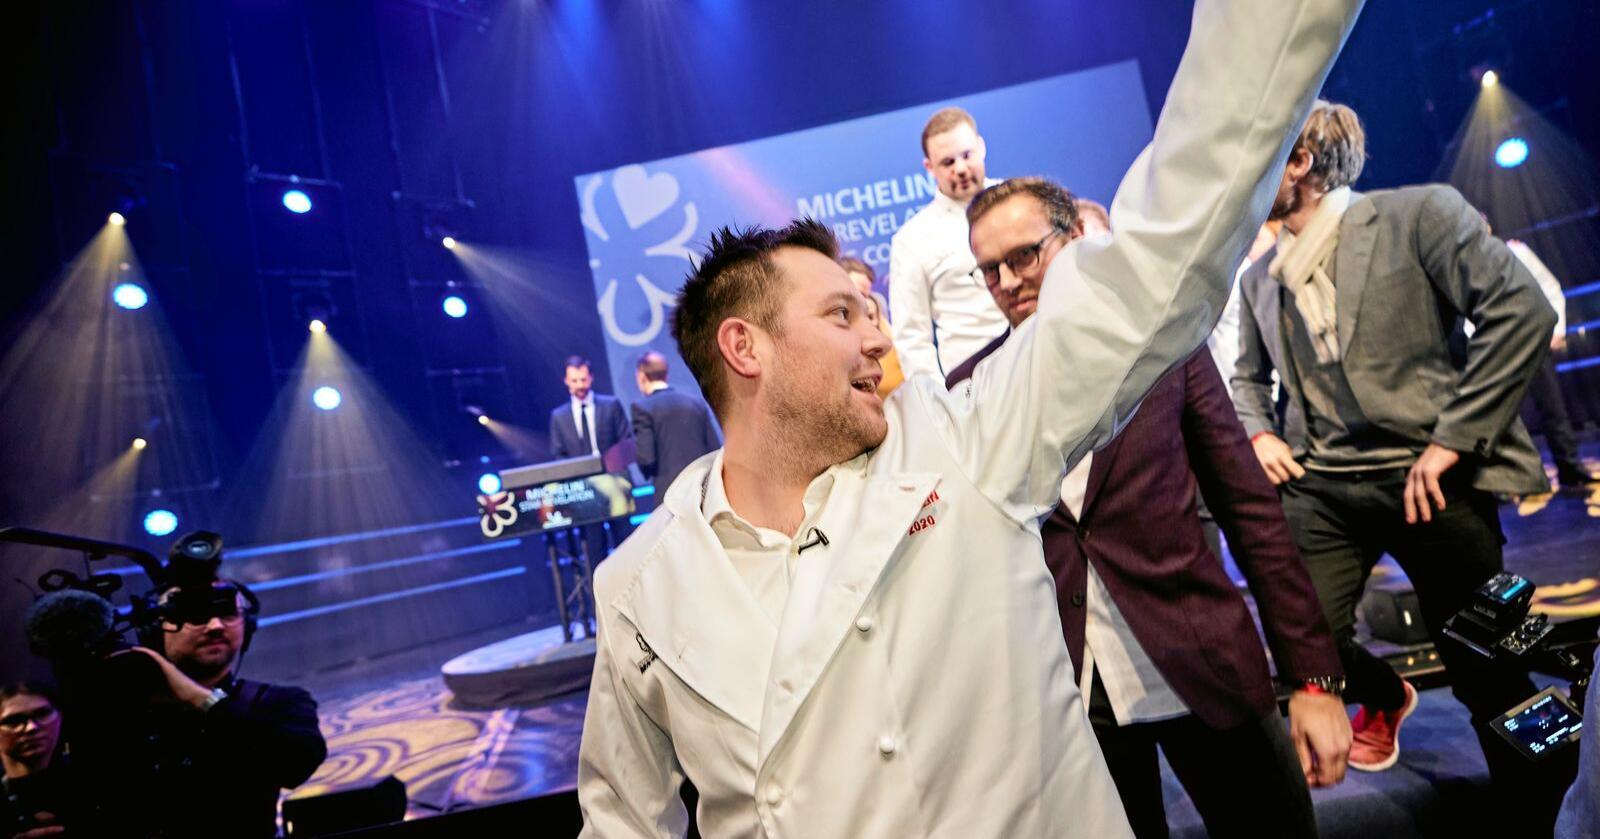 Stjernekokk: Christopher Davidsen og Restaurant Speilsalen fikk Trondheims tredje michelinstjerne. Snobberiets glansdager eller en boost for norsk jordbruk? Foto: Ole Martin Wold/NTB scanpix